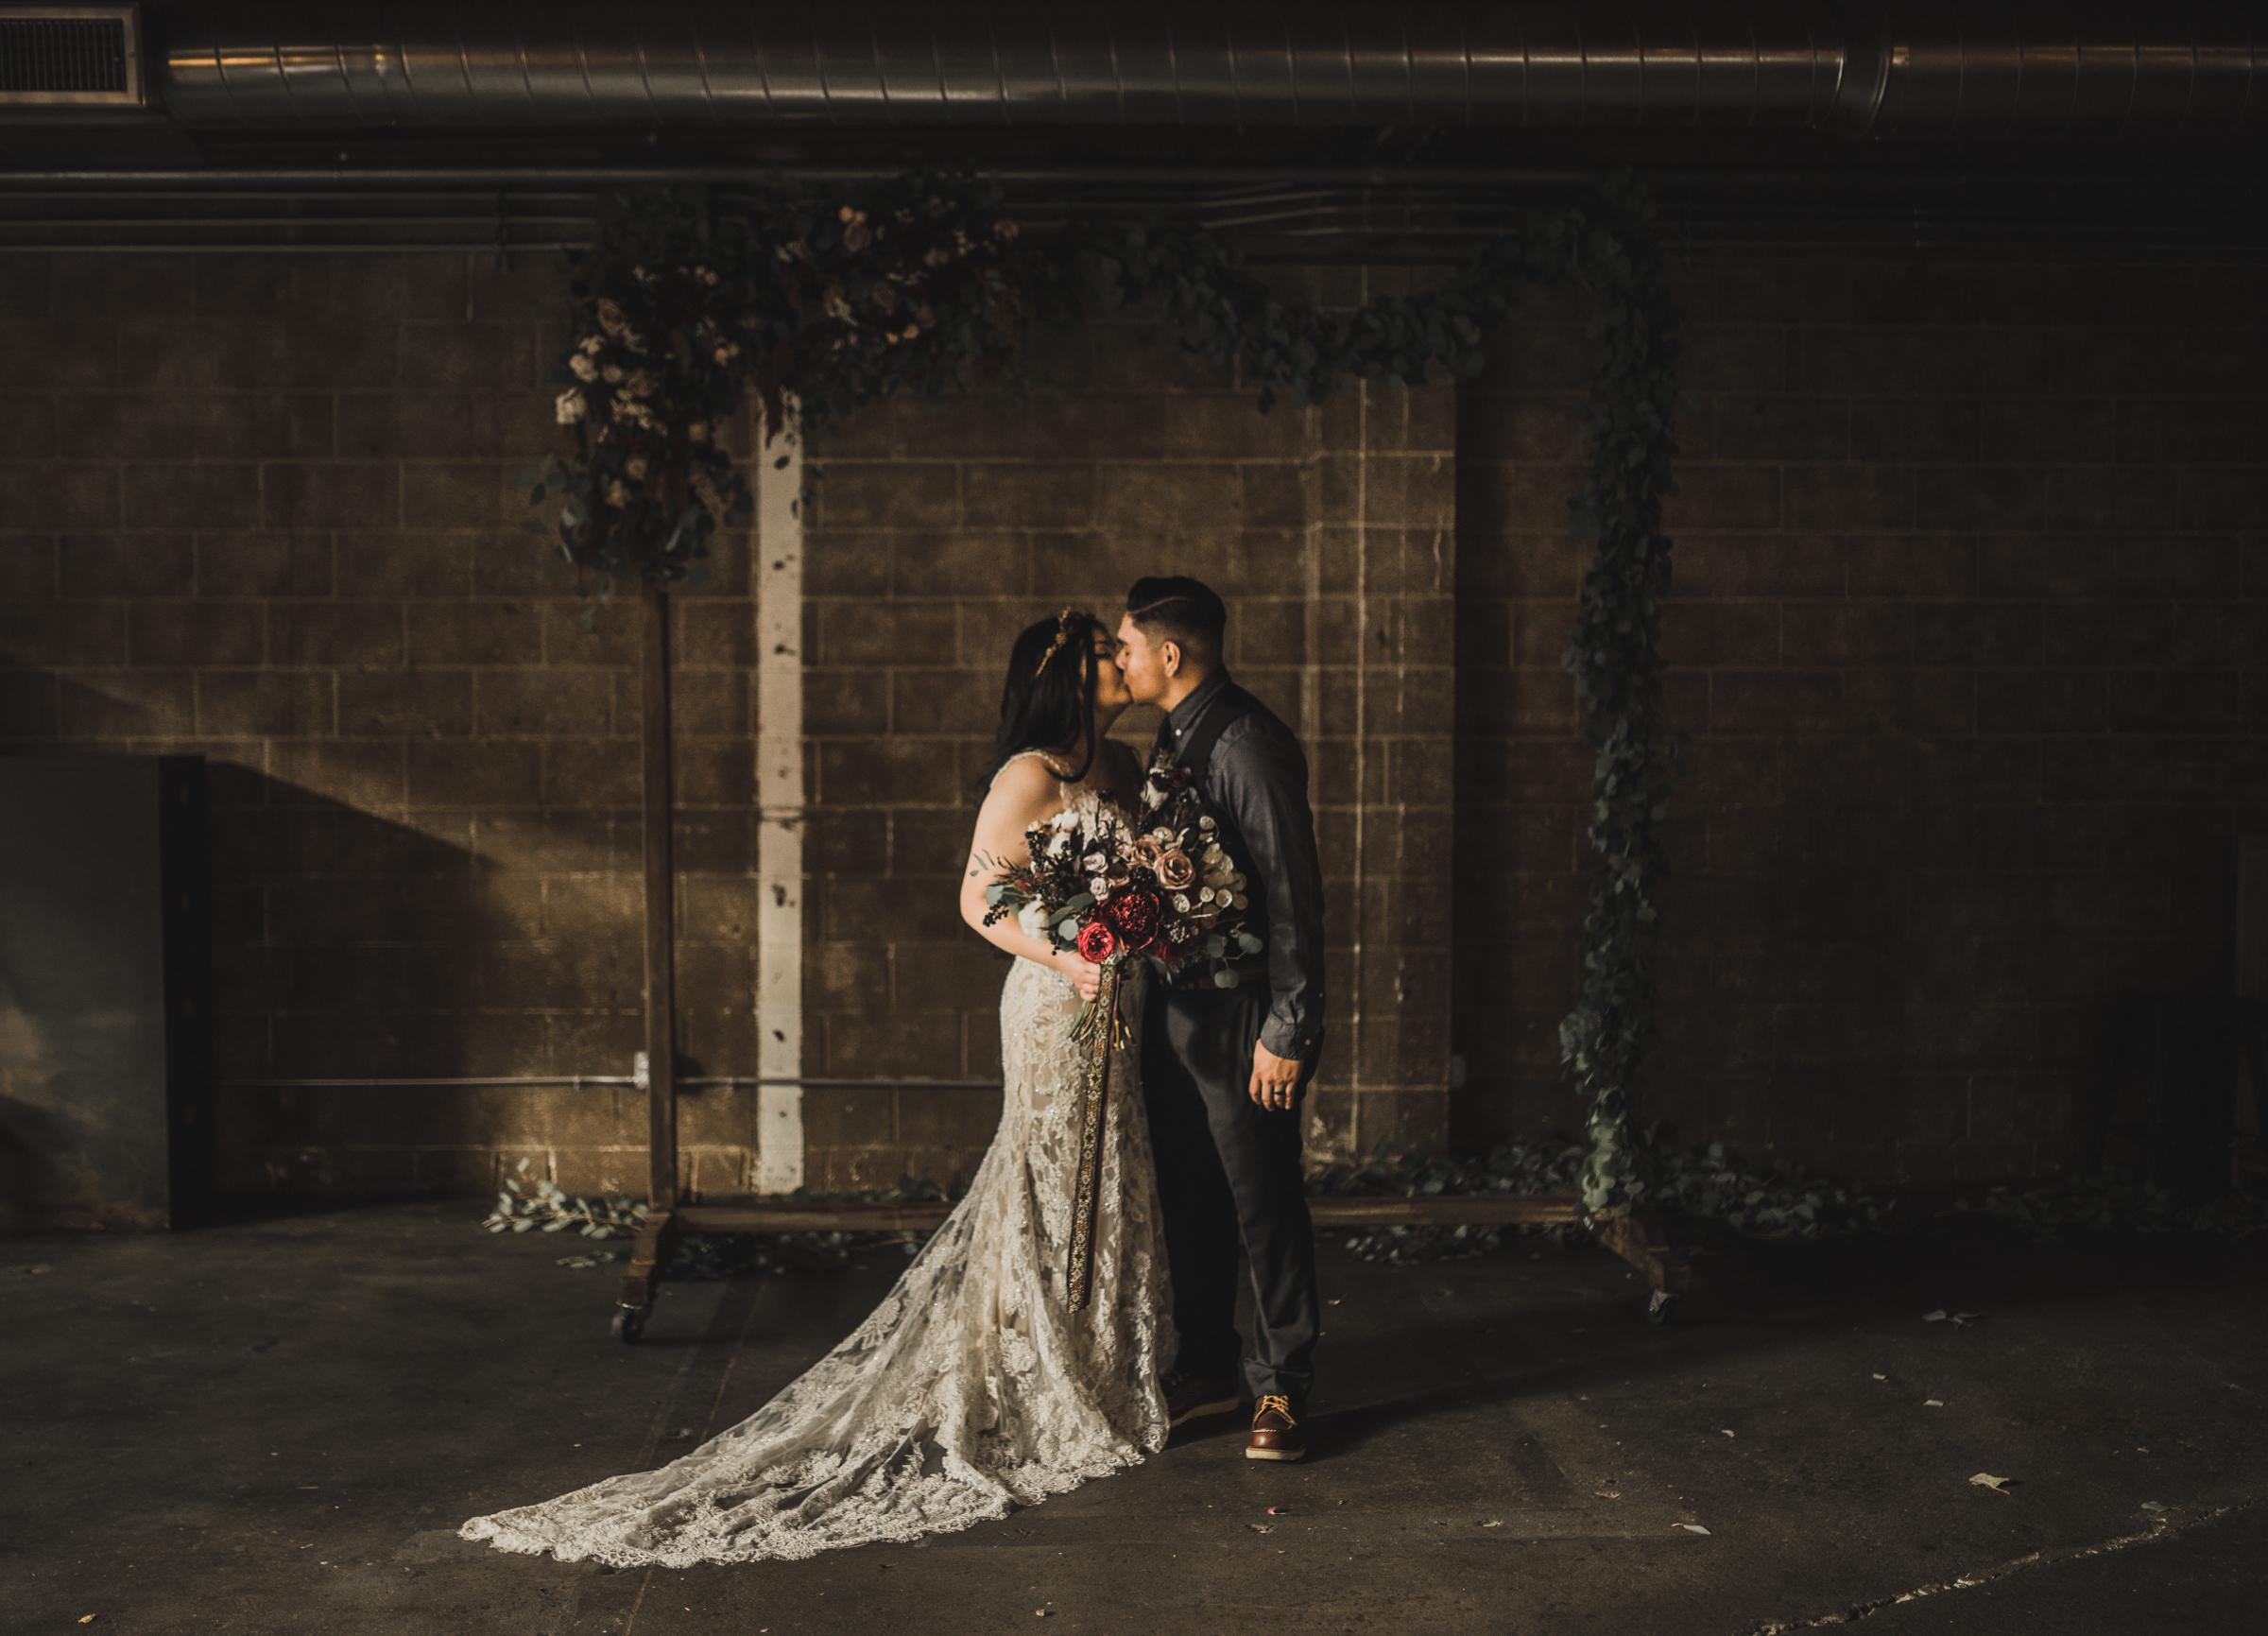 ©Isaiah + Taylor Photography - Smoky Hollow Studios Wedding, El Segundo, Los Angeles Wedding Photographer-117.jpg